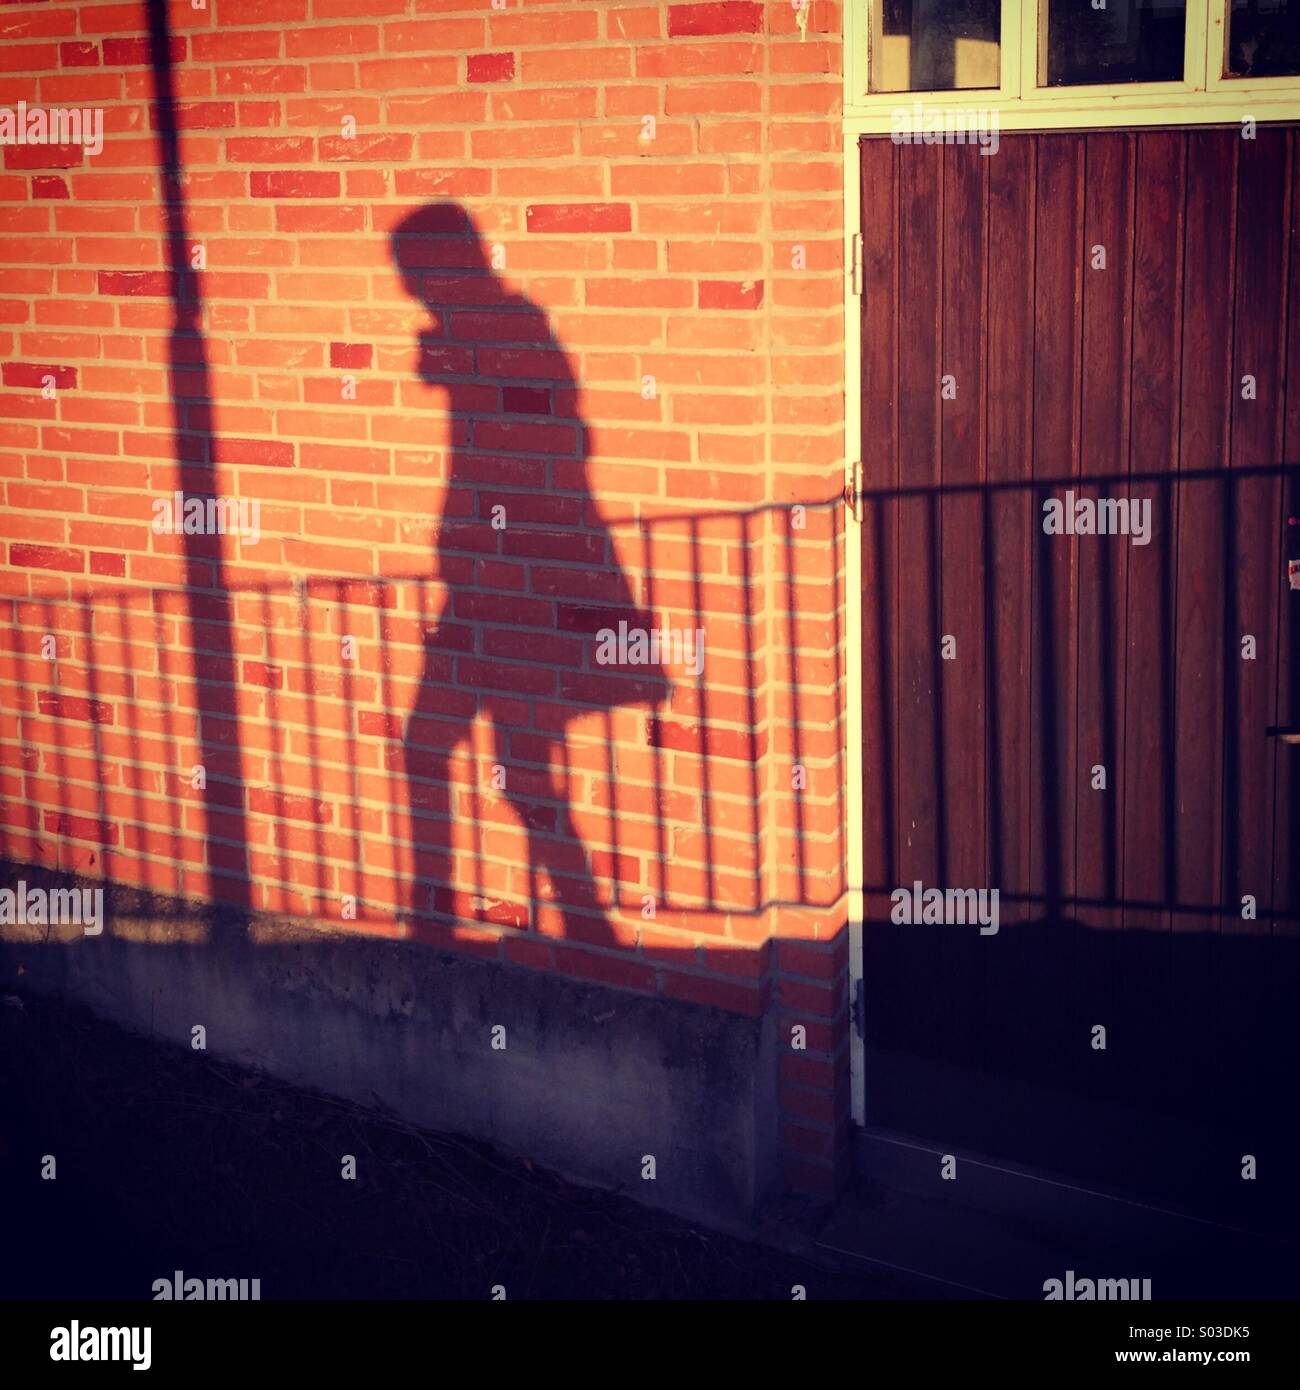 Shadow - Stock Image